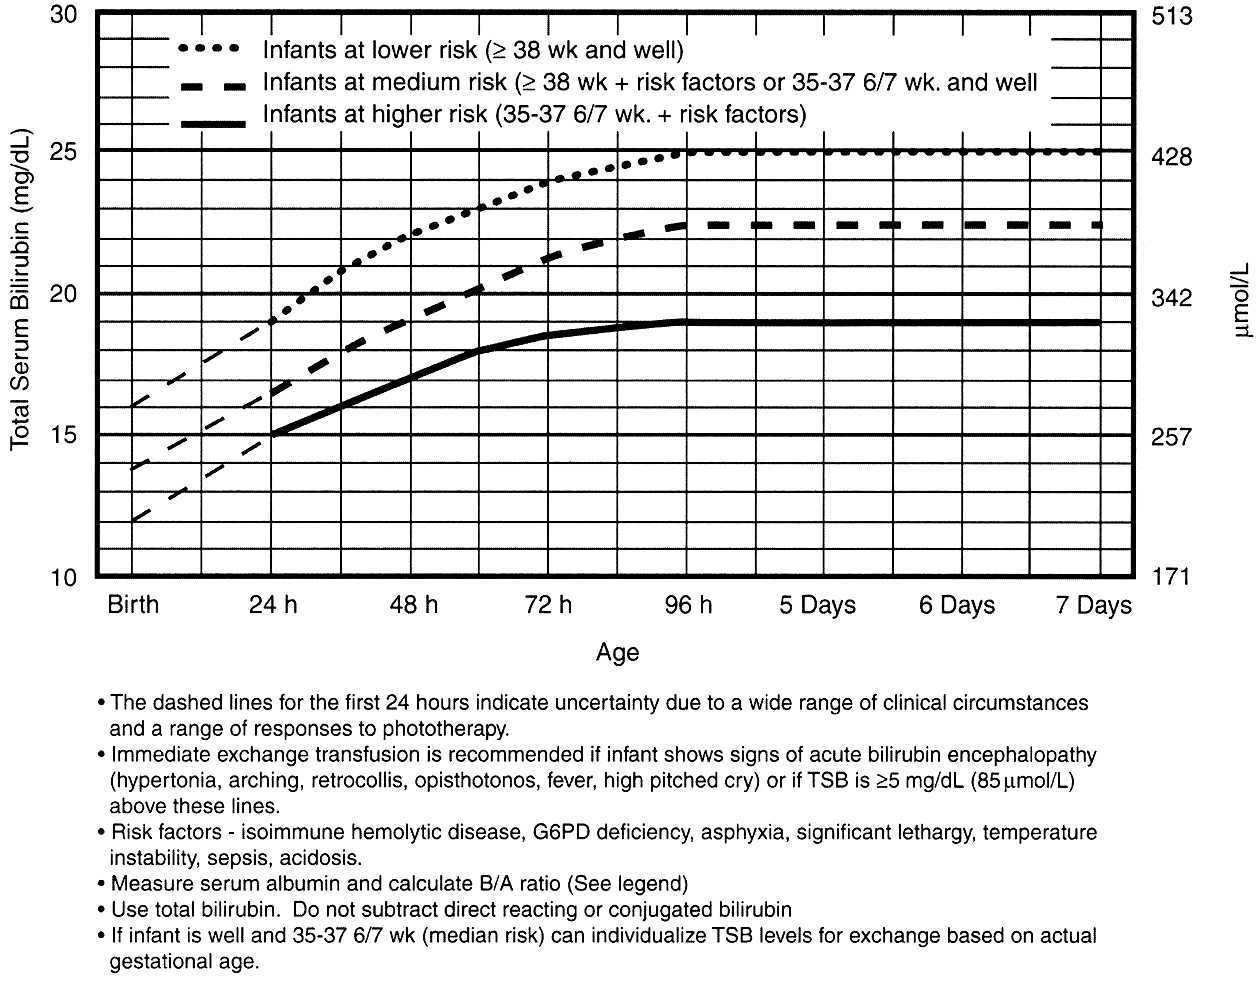 Treatment Neonatal Jaundice Guidelines